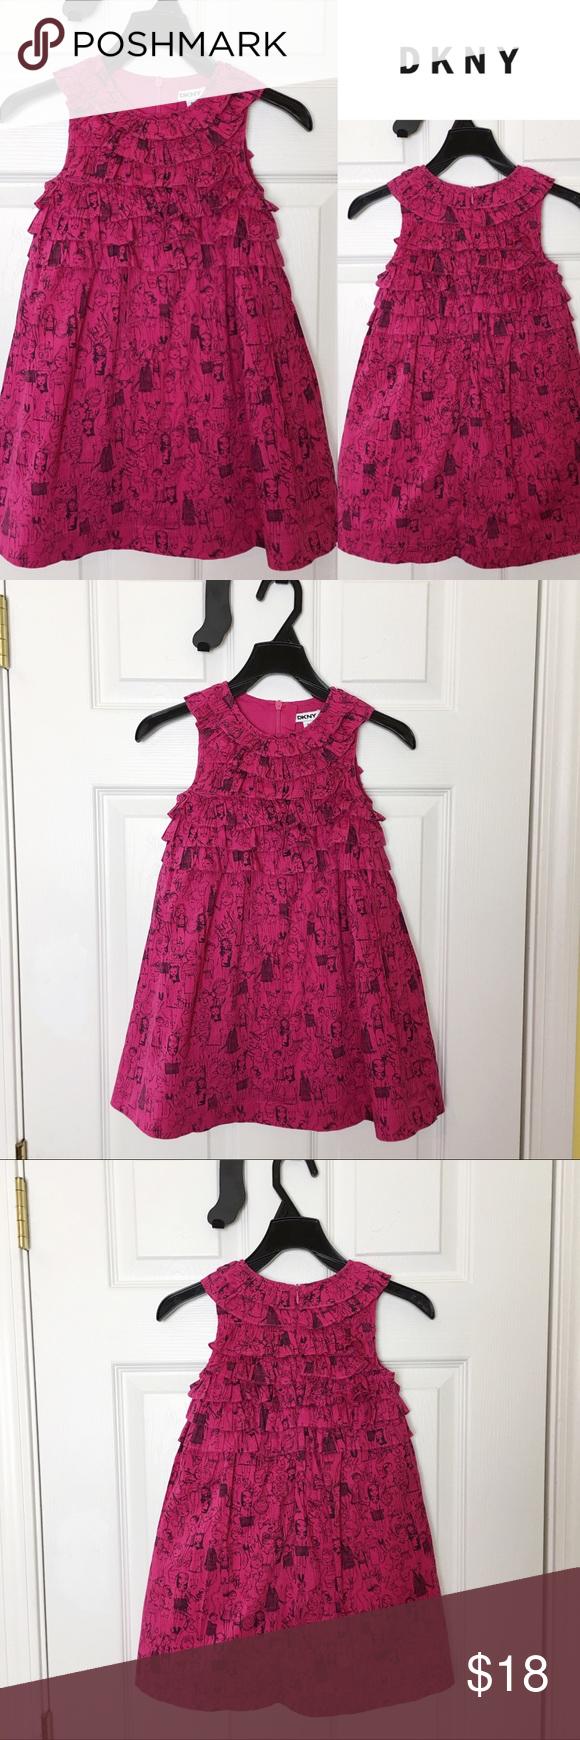 Dkny Girls Hot Pink Dress Barely Gently Worn Dkny Girls Hot Pink Dress Size 4t 100 Cotton Dkny Dresses C Hot Pink Dresses Pink Dress Dkny Dress [ 1740 x 580 Pixel ]